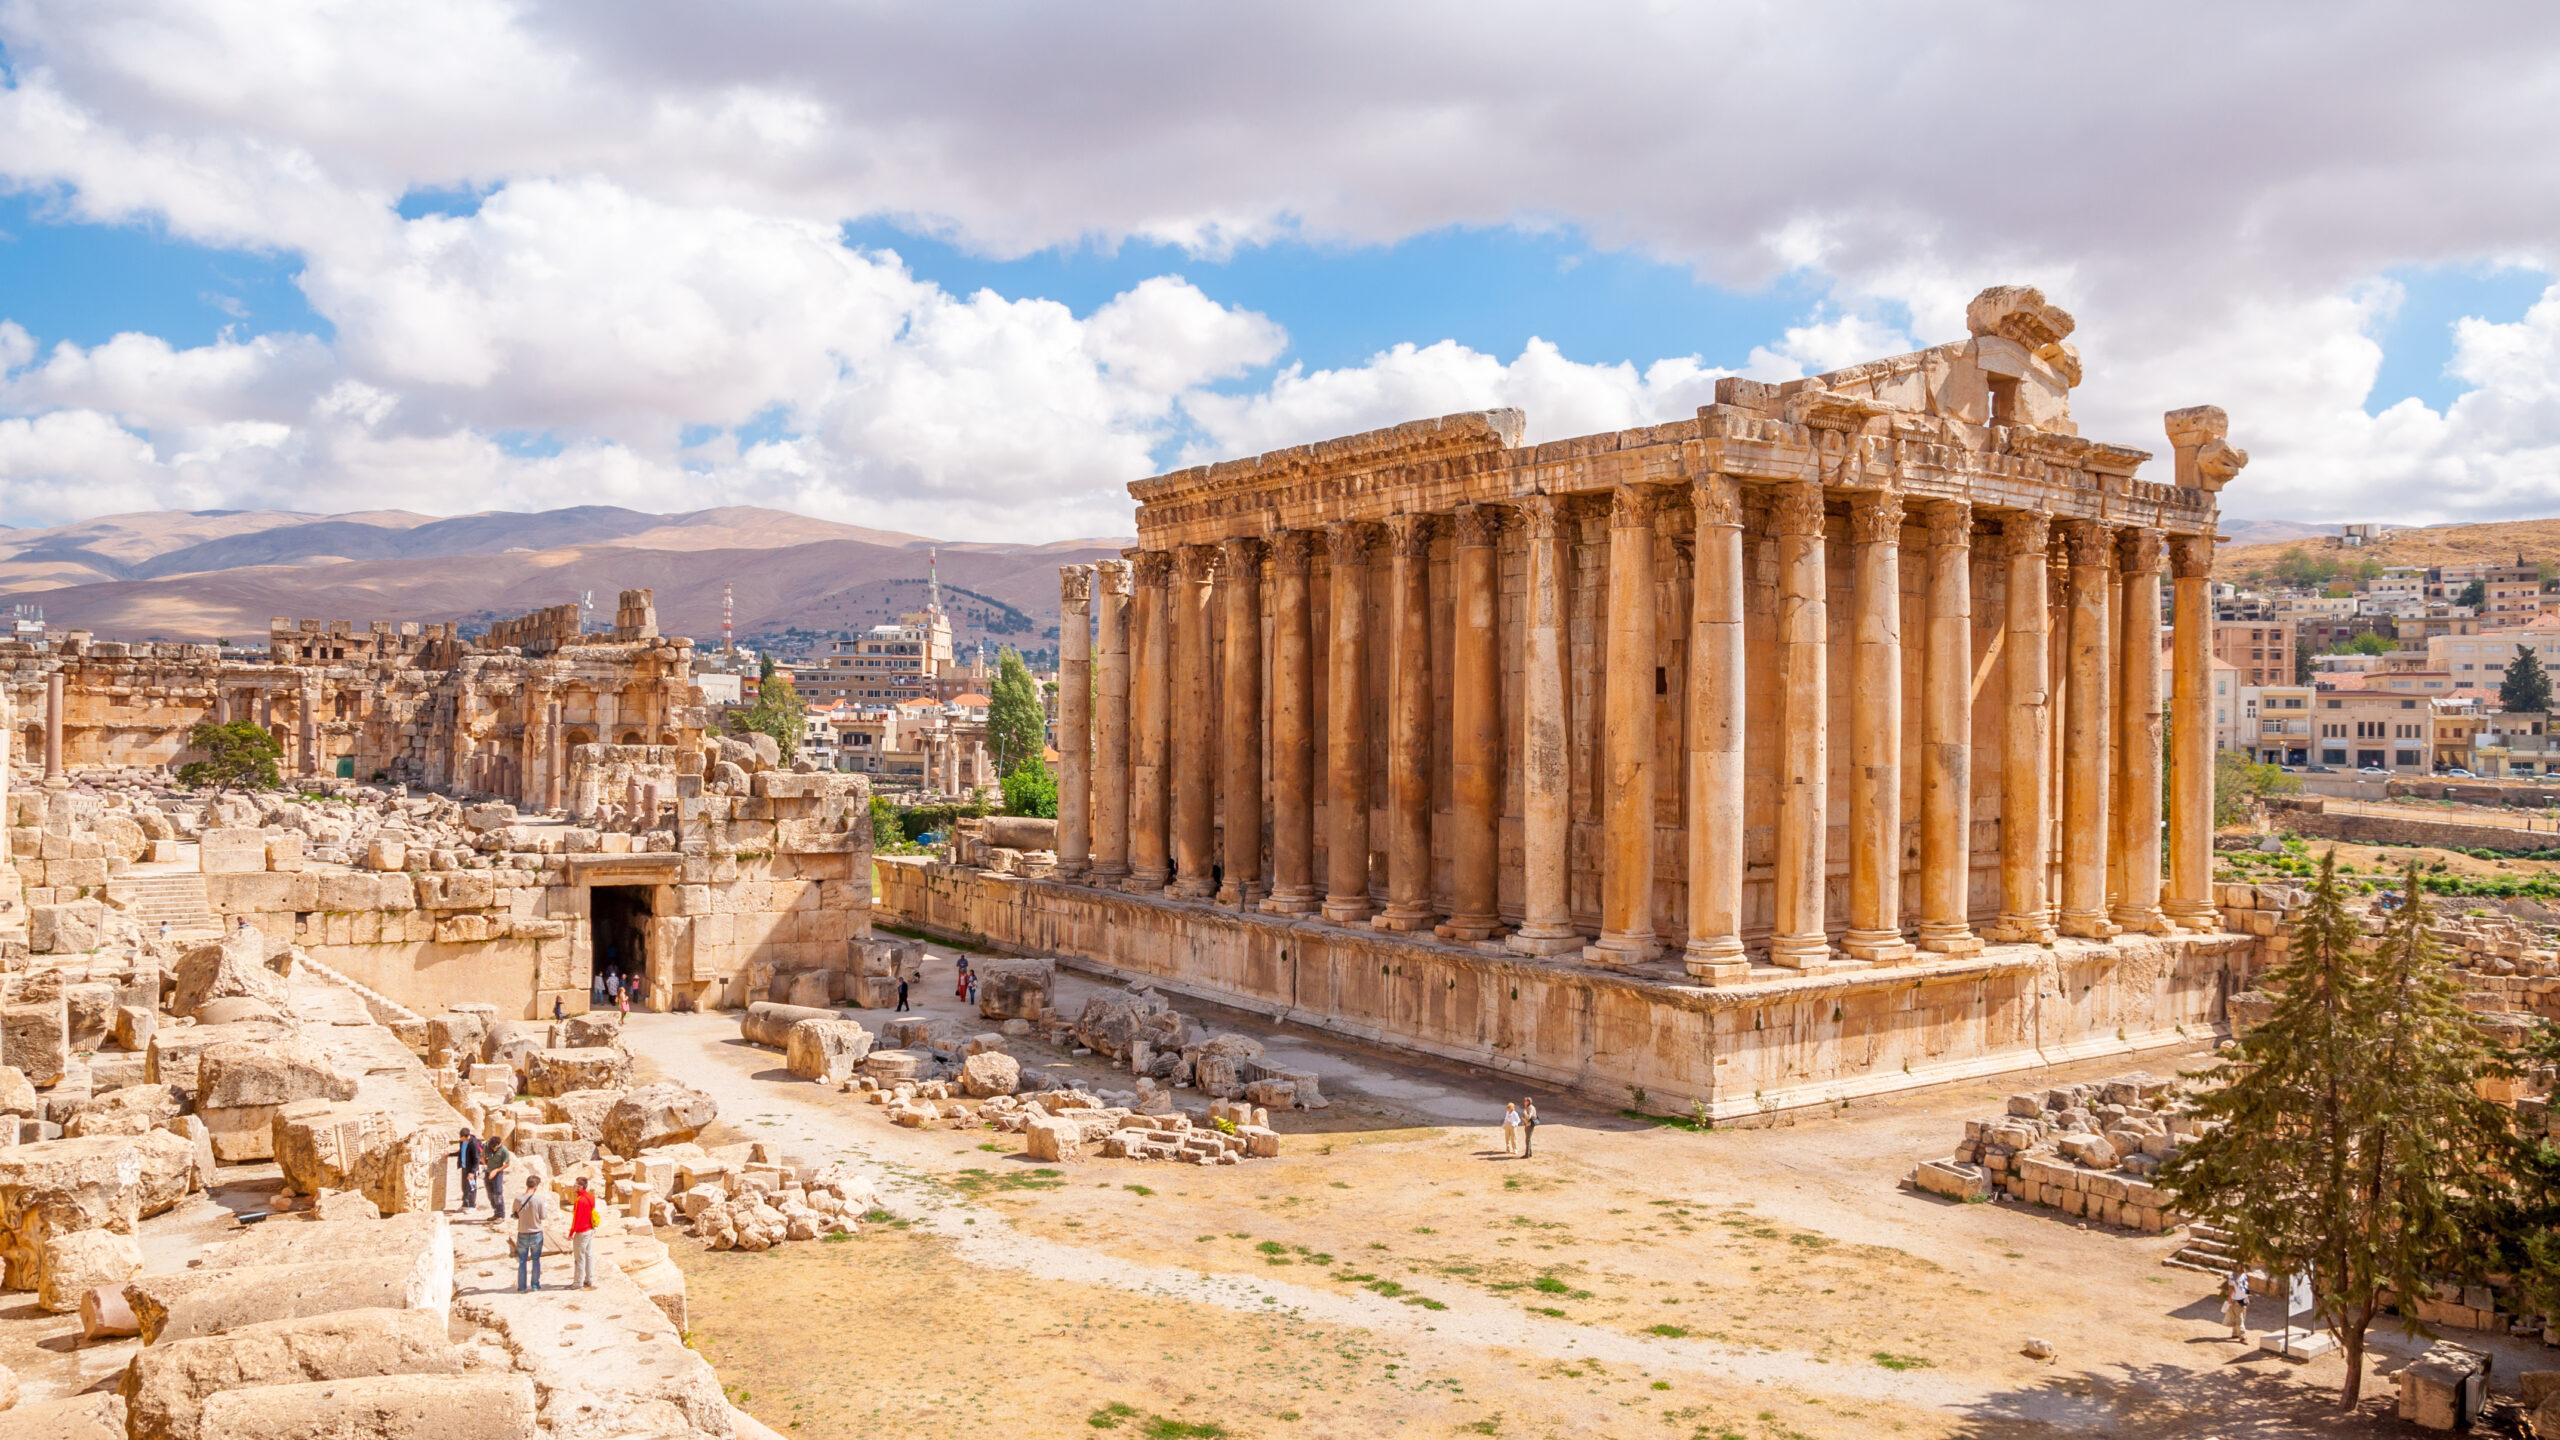 Bacchus temple in Baalbek, Lebanon